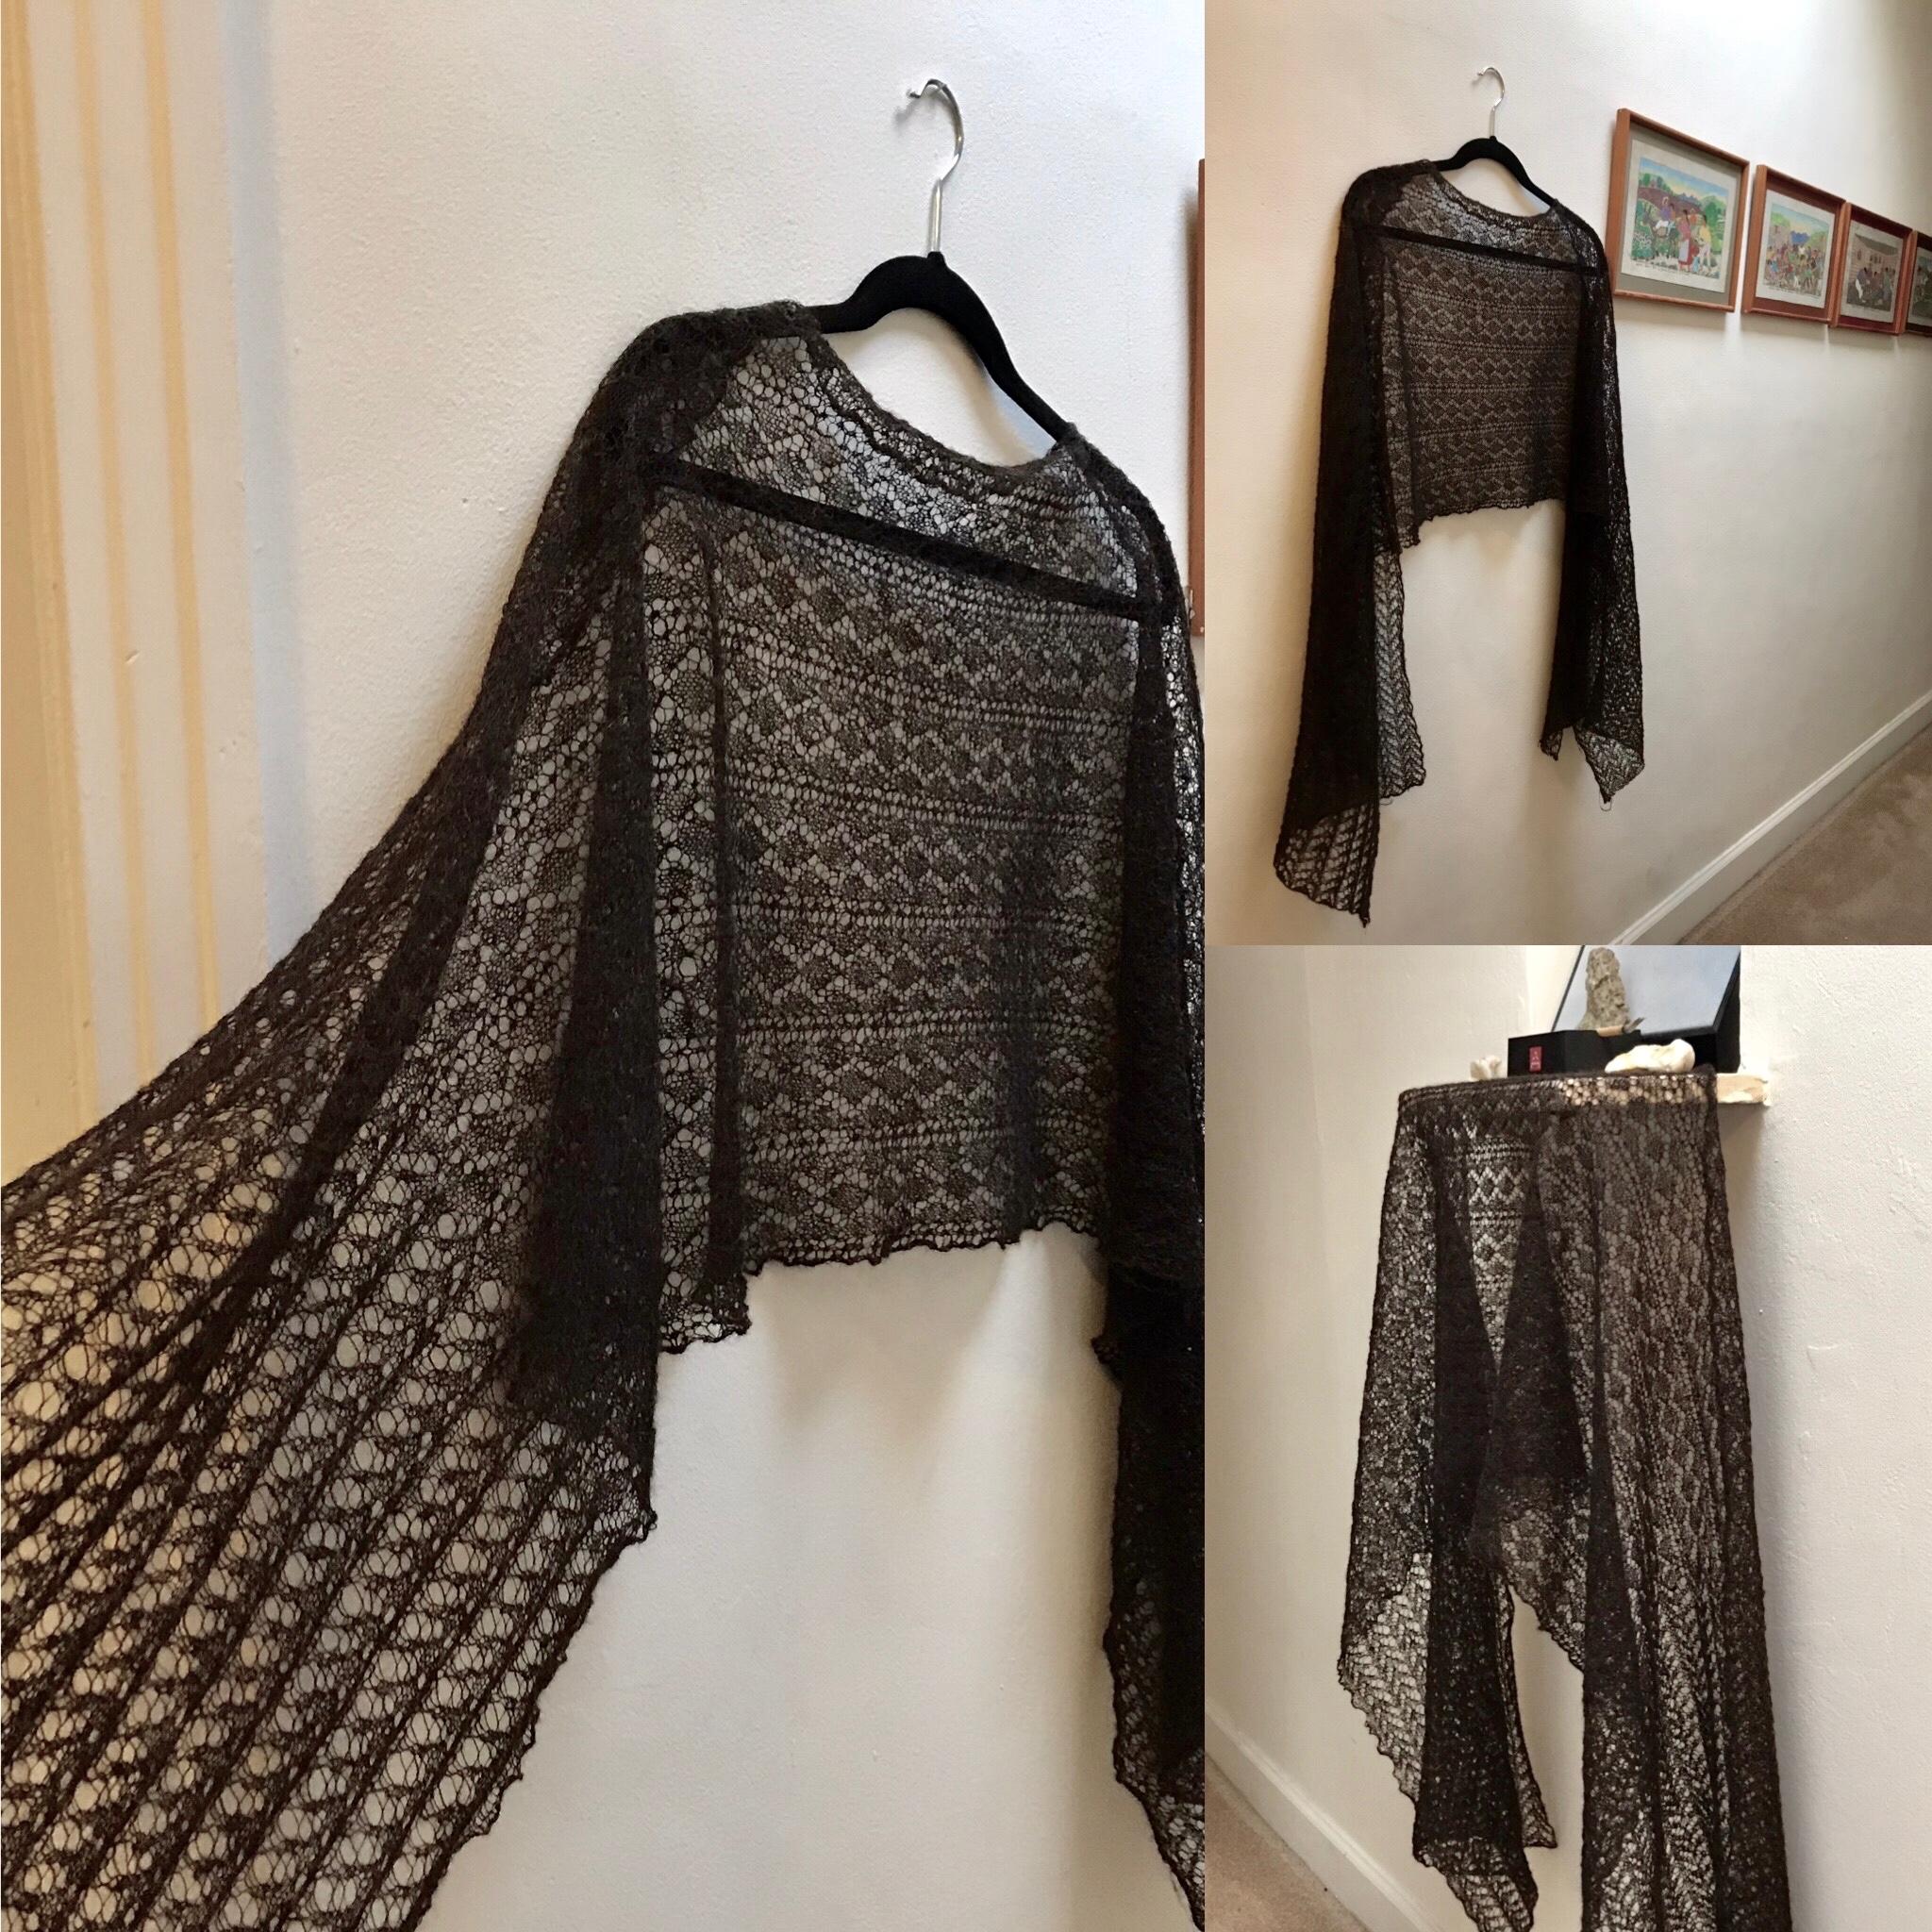 Museum Knitting